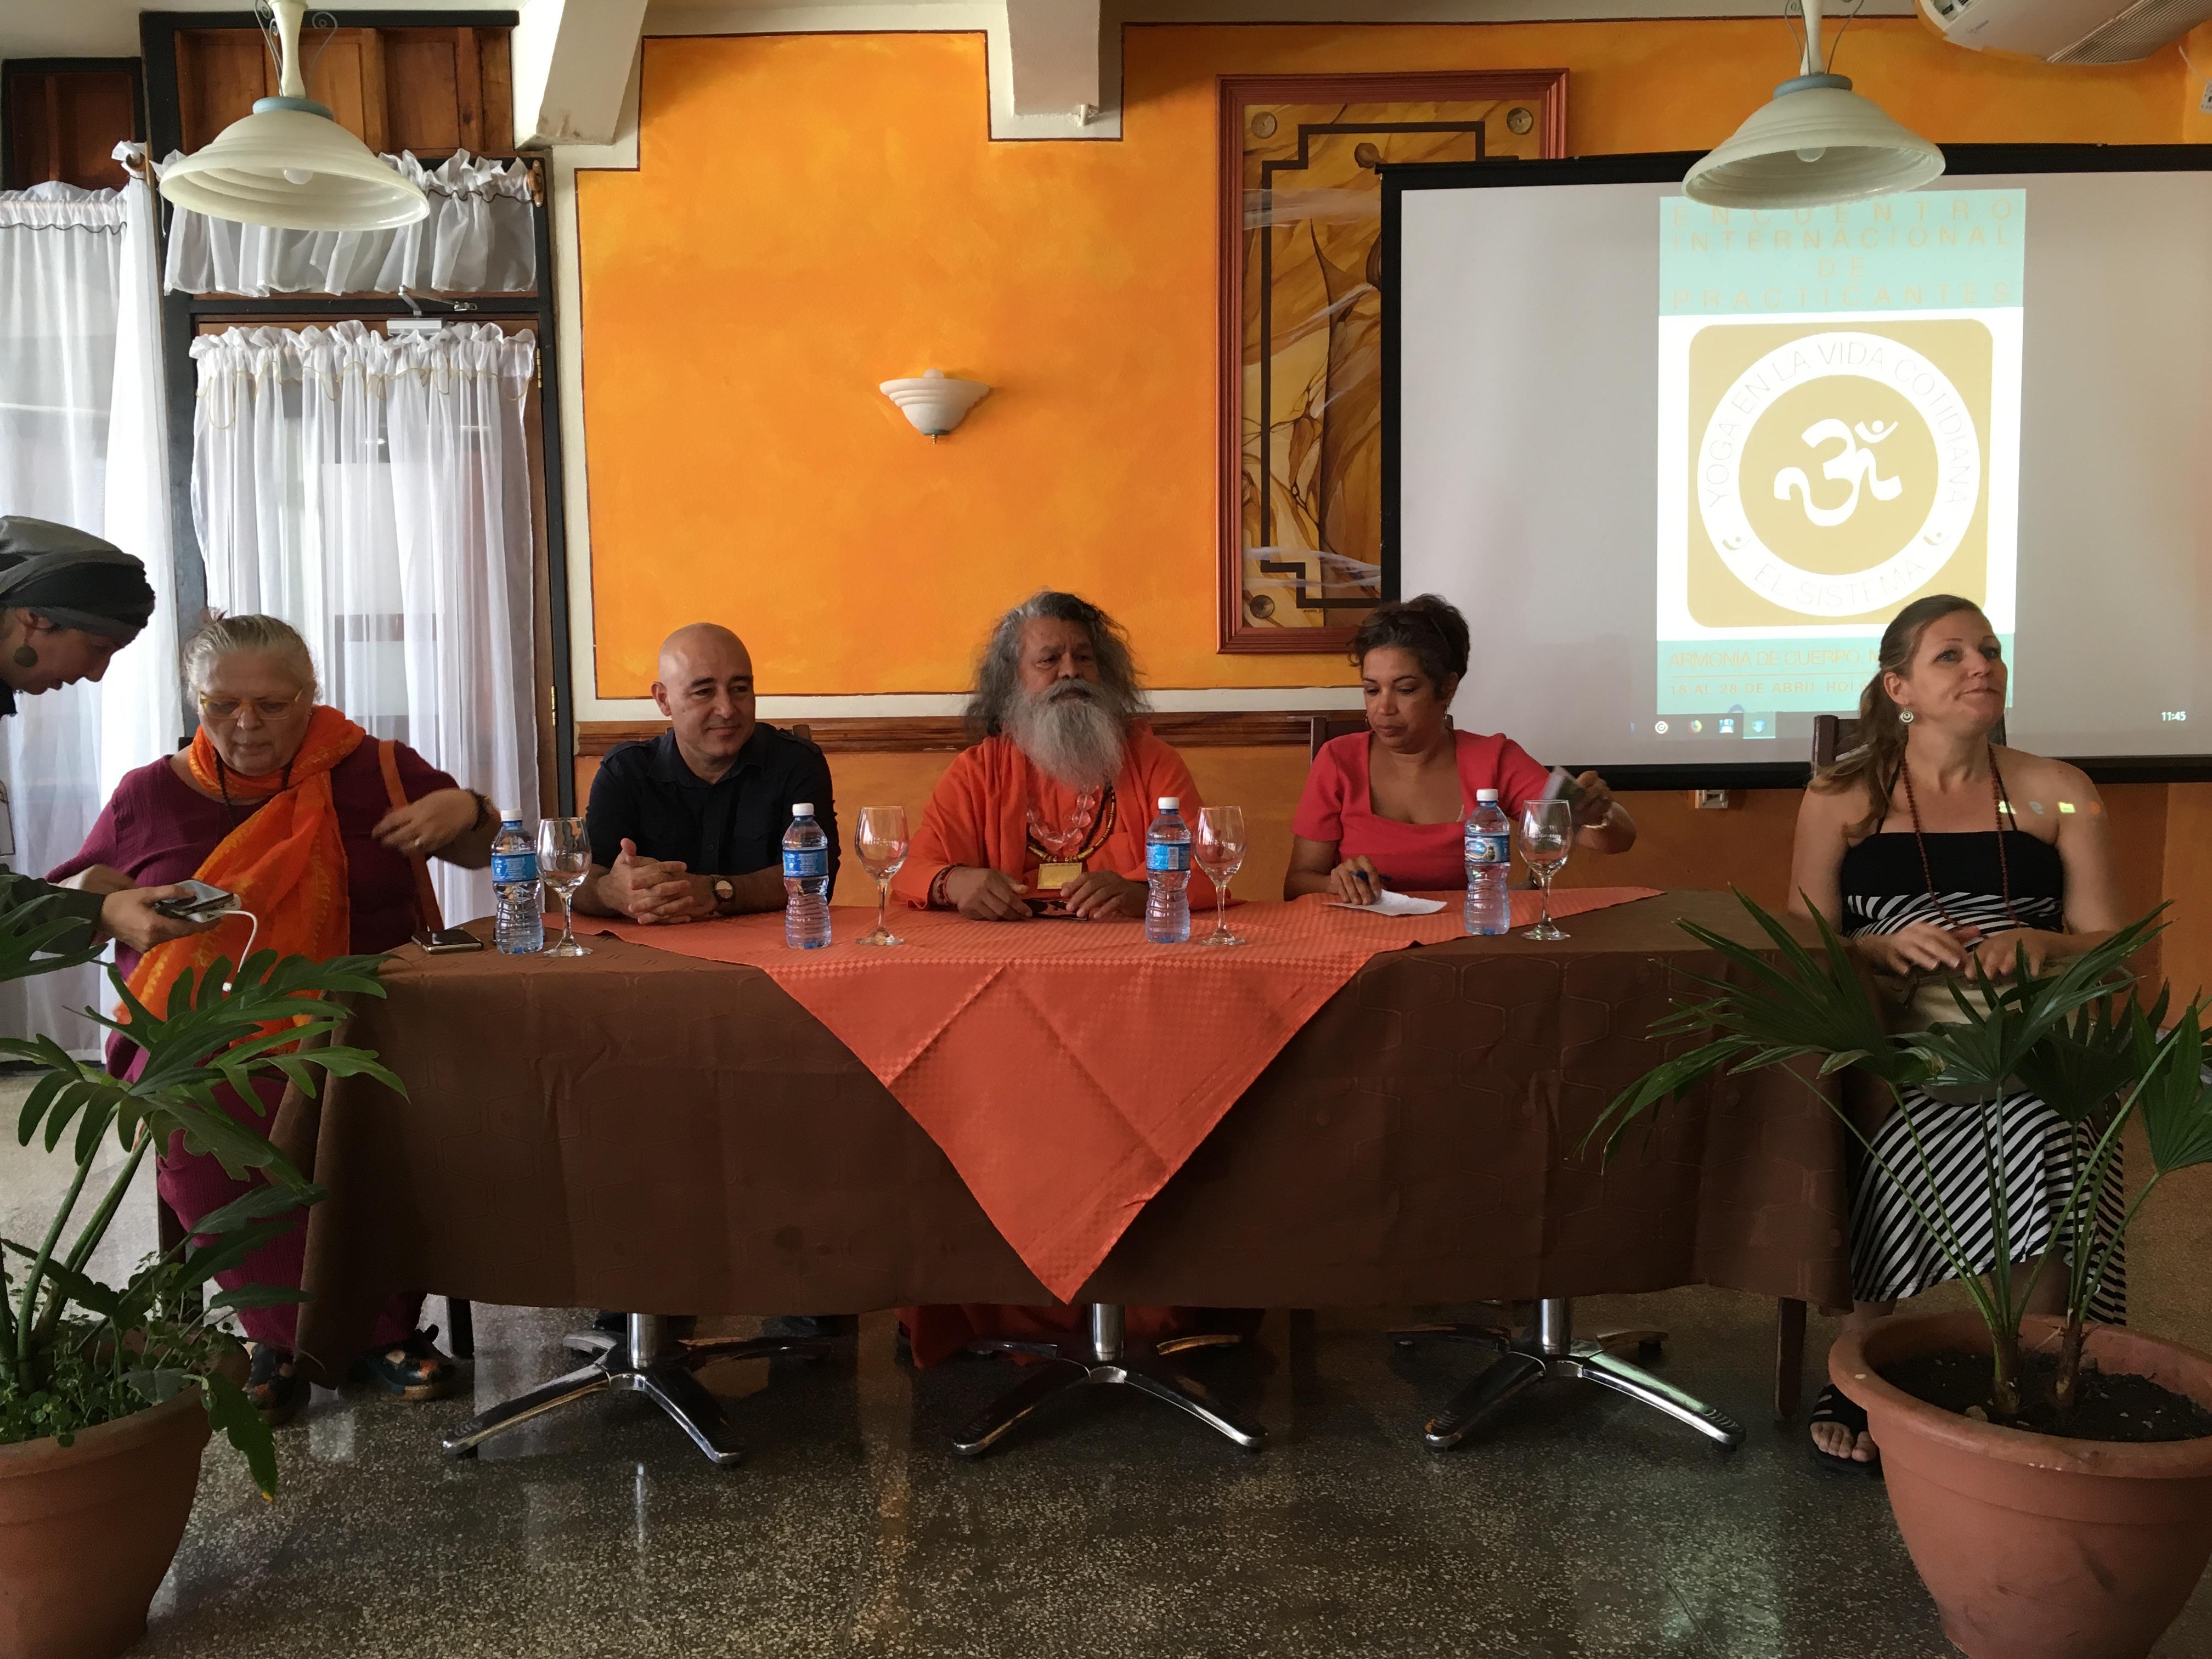 SS Vishwaguruji en conferencia de prensa Foto: Arlene Gómez